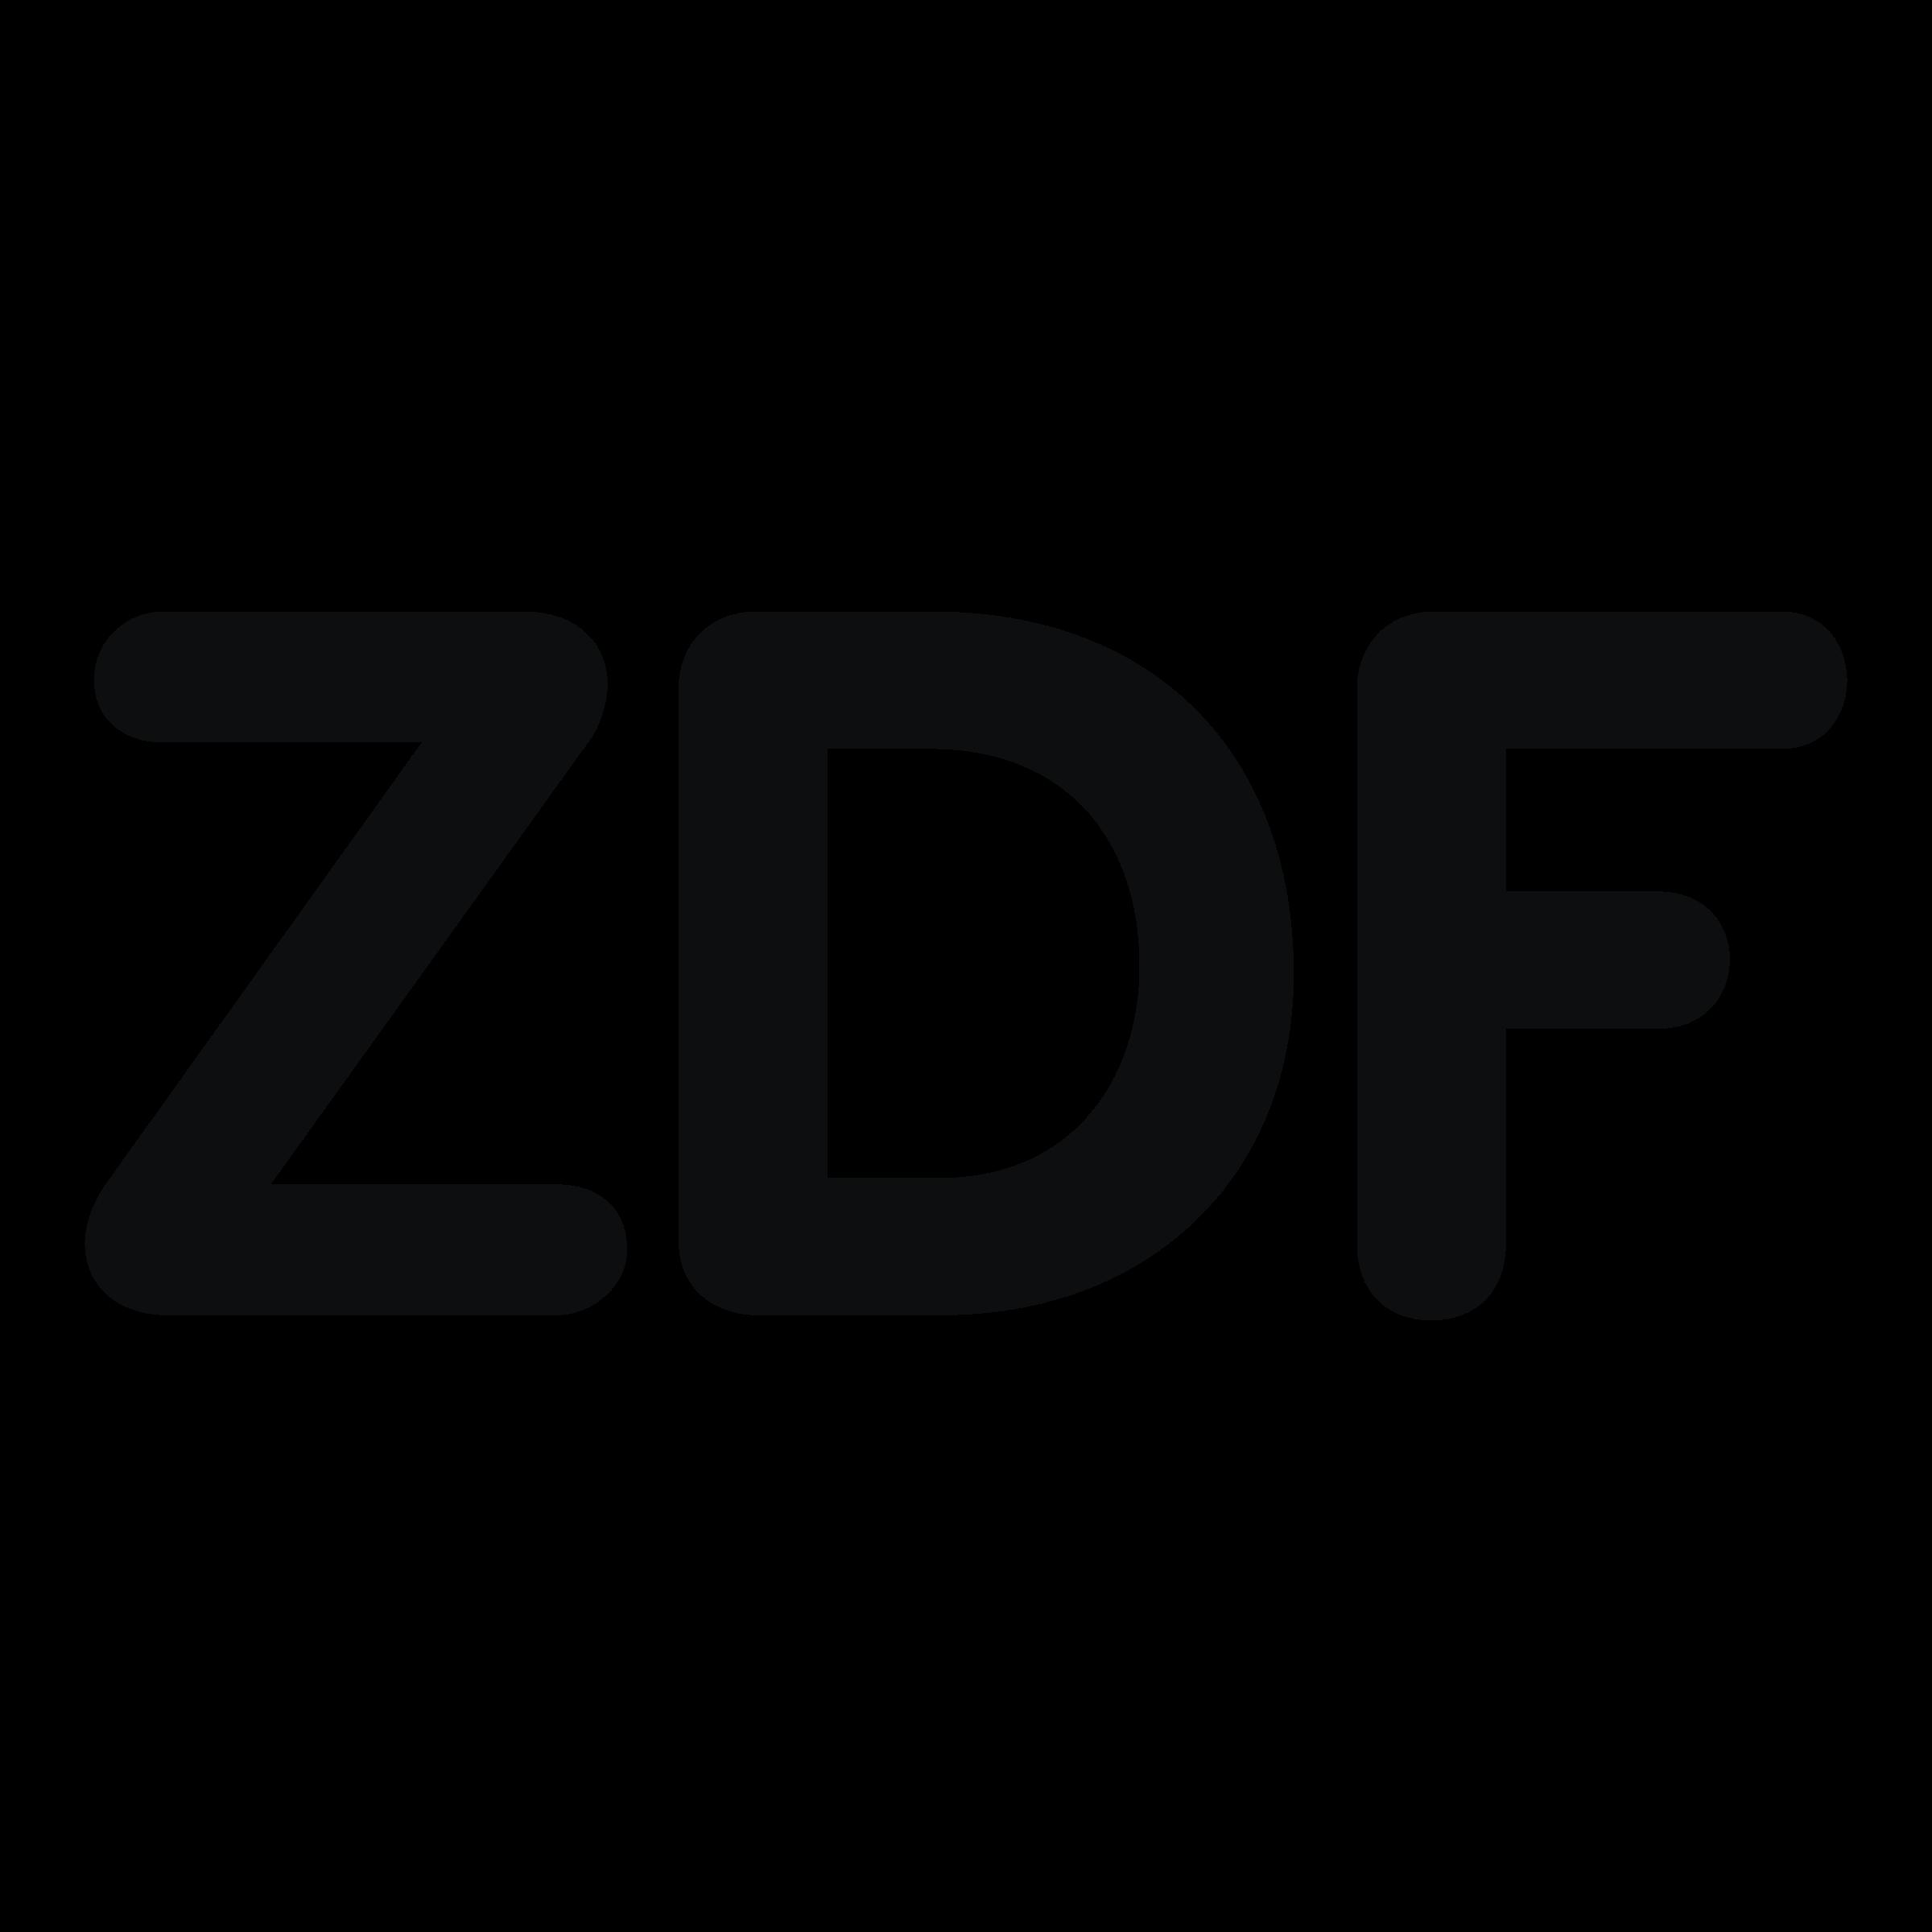 ZDF Logo PNG Transparent & SVG Vector.